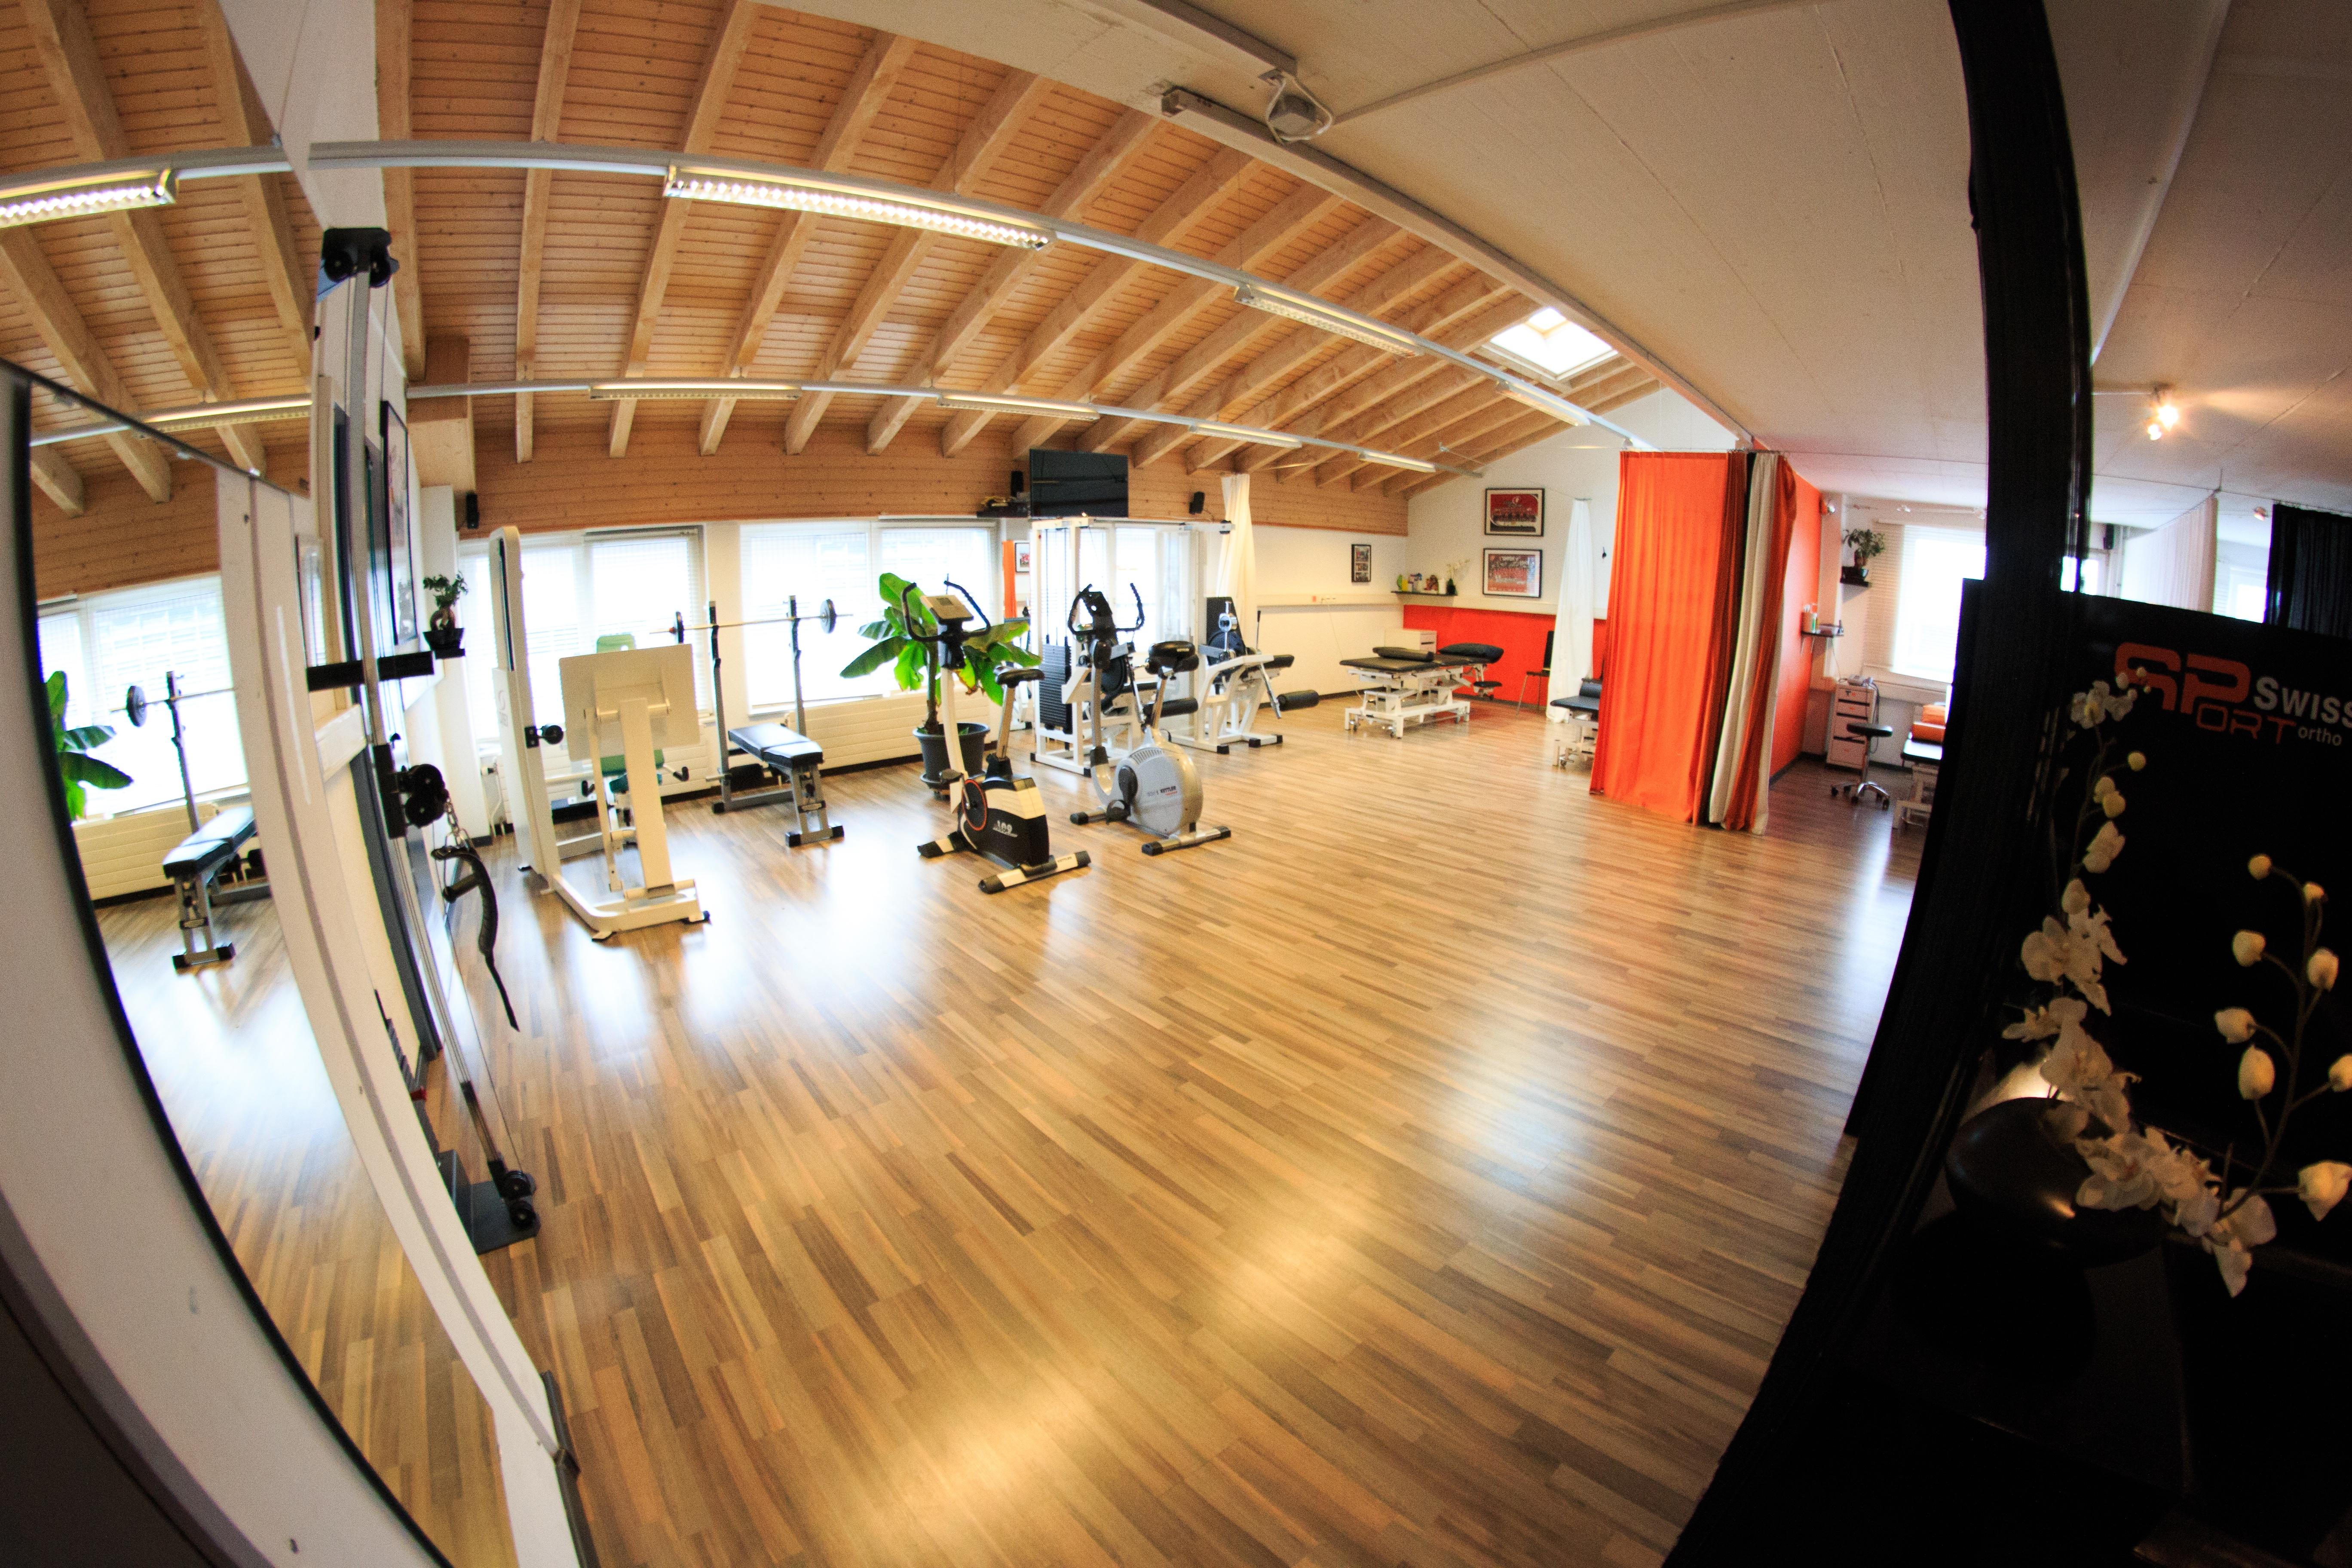 sPhysical physiothérapie sport center echallens